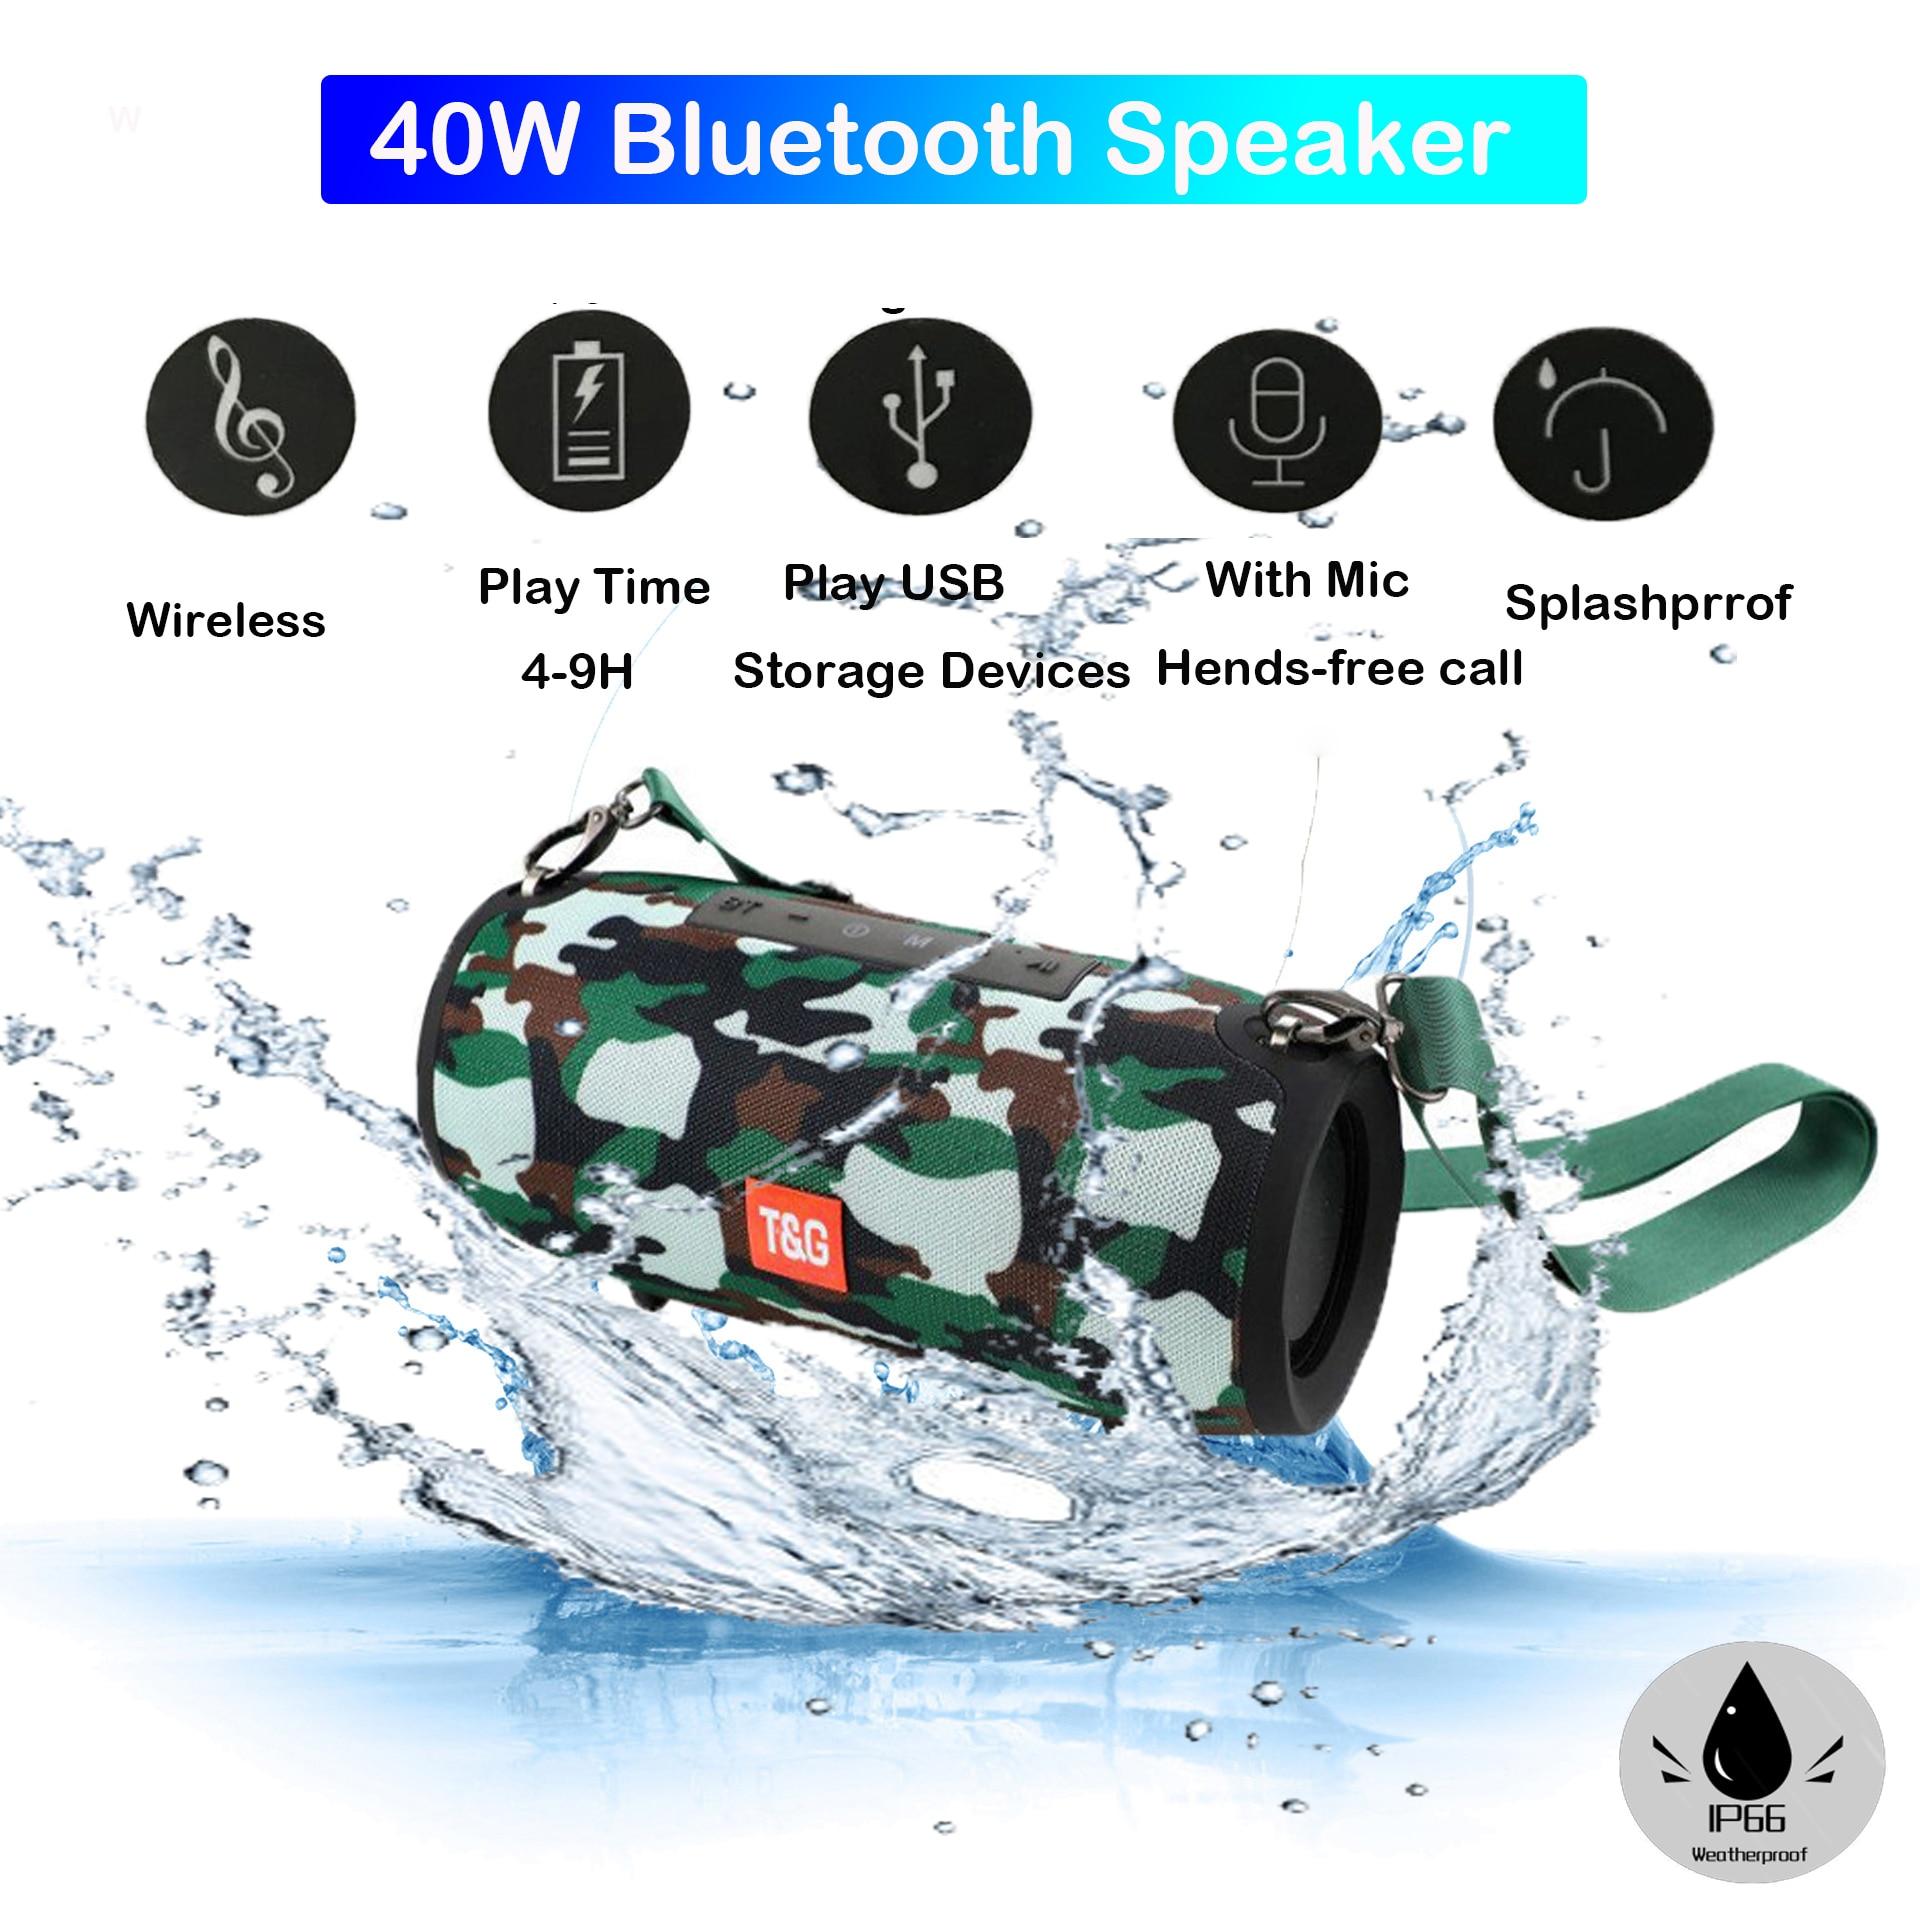 Portable Bluetooth Speaker 40w Wireless Bass Column Waterproof Outdoor Speaker Support AUX TF USB Boom box Stereo Loudspeaker